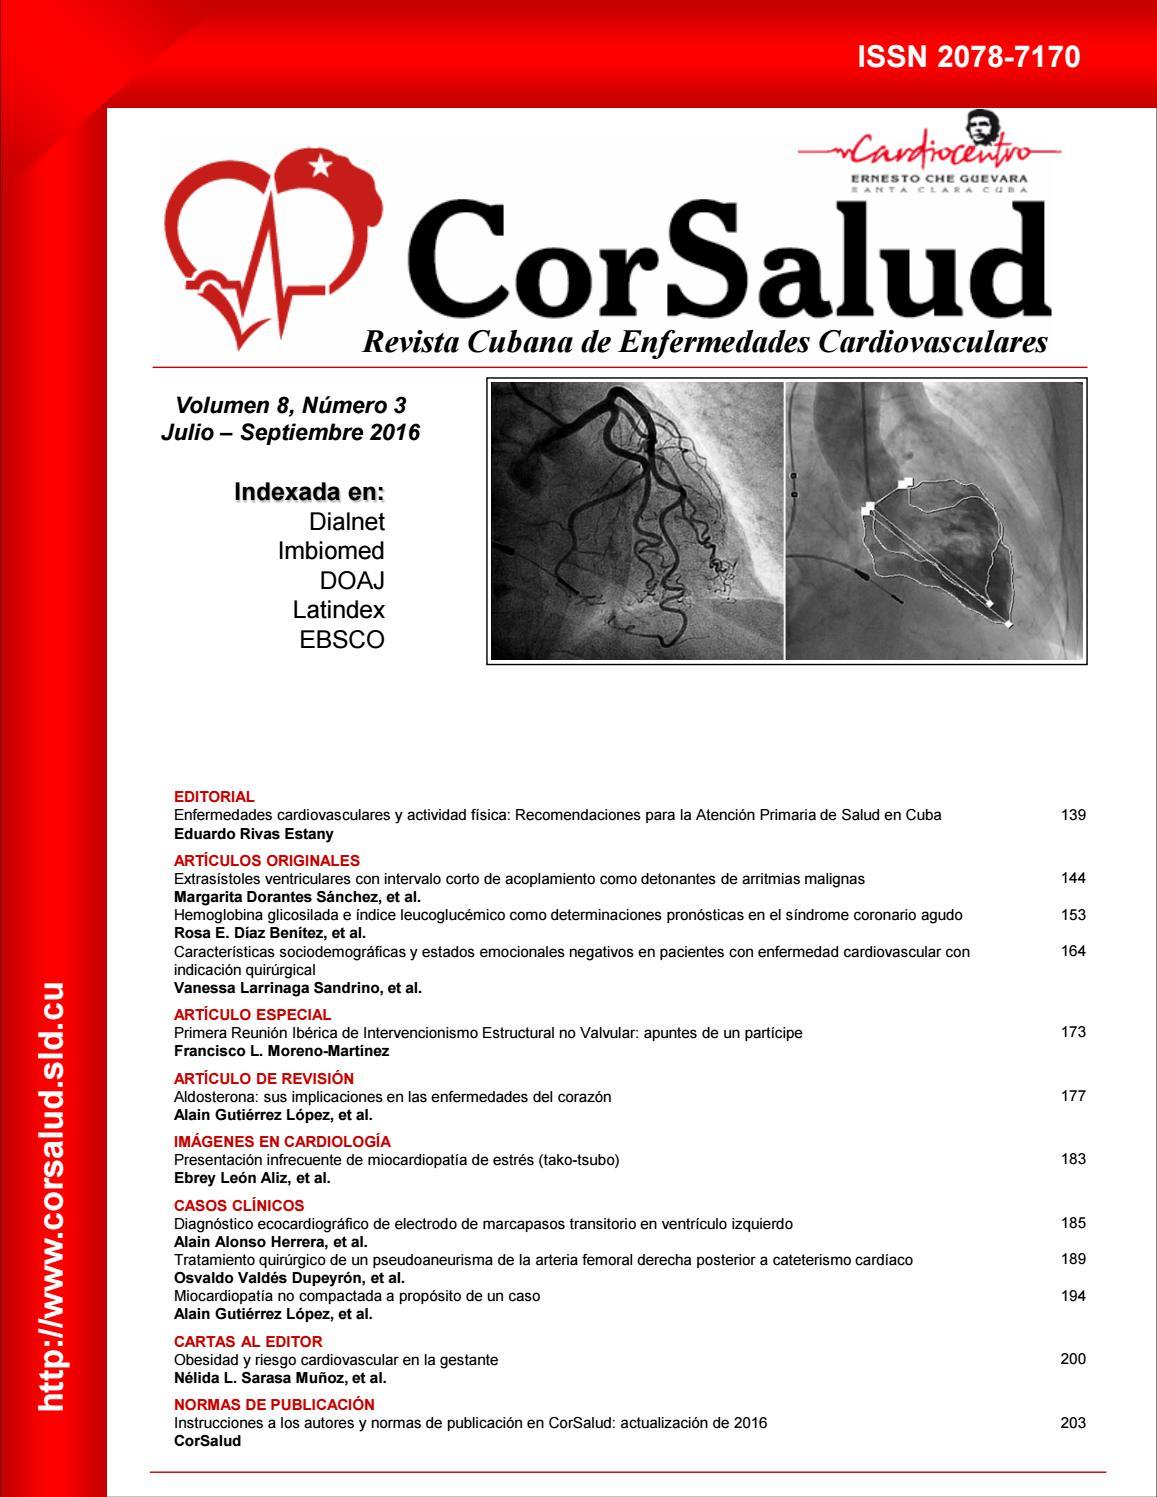 libro de códigos de diabetes mellitus dependiente de insulina icd 10